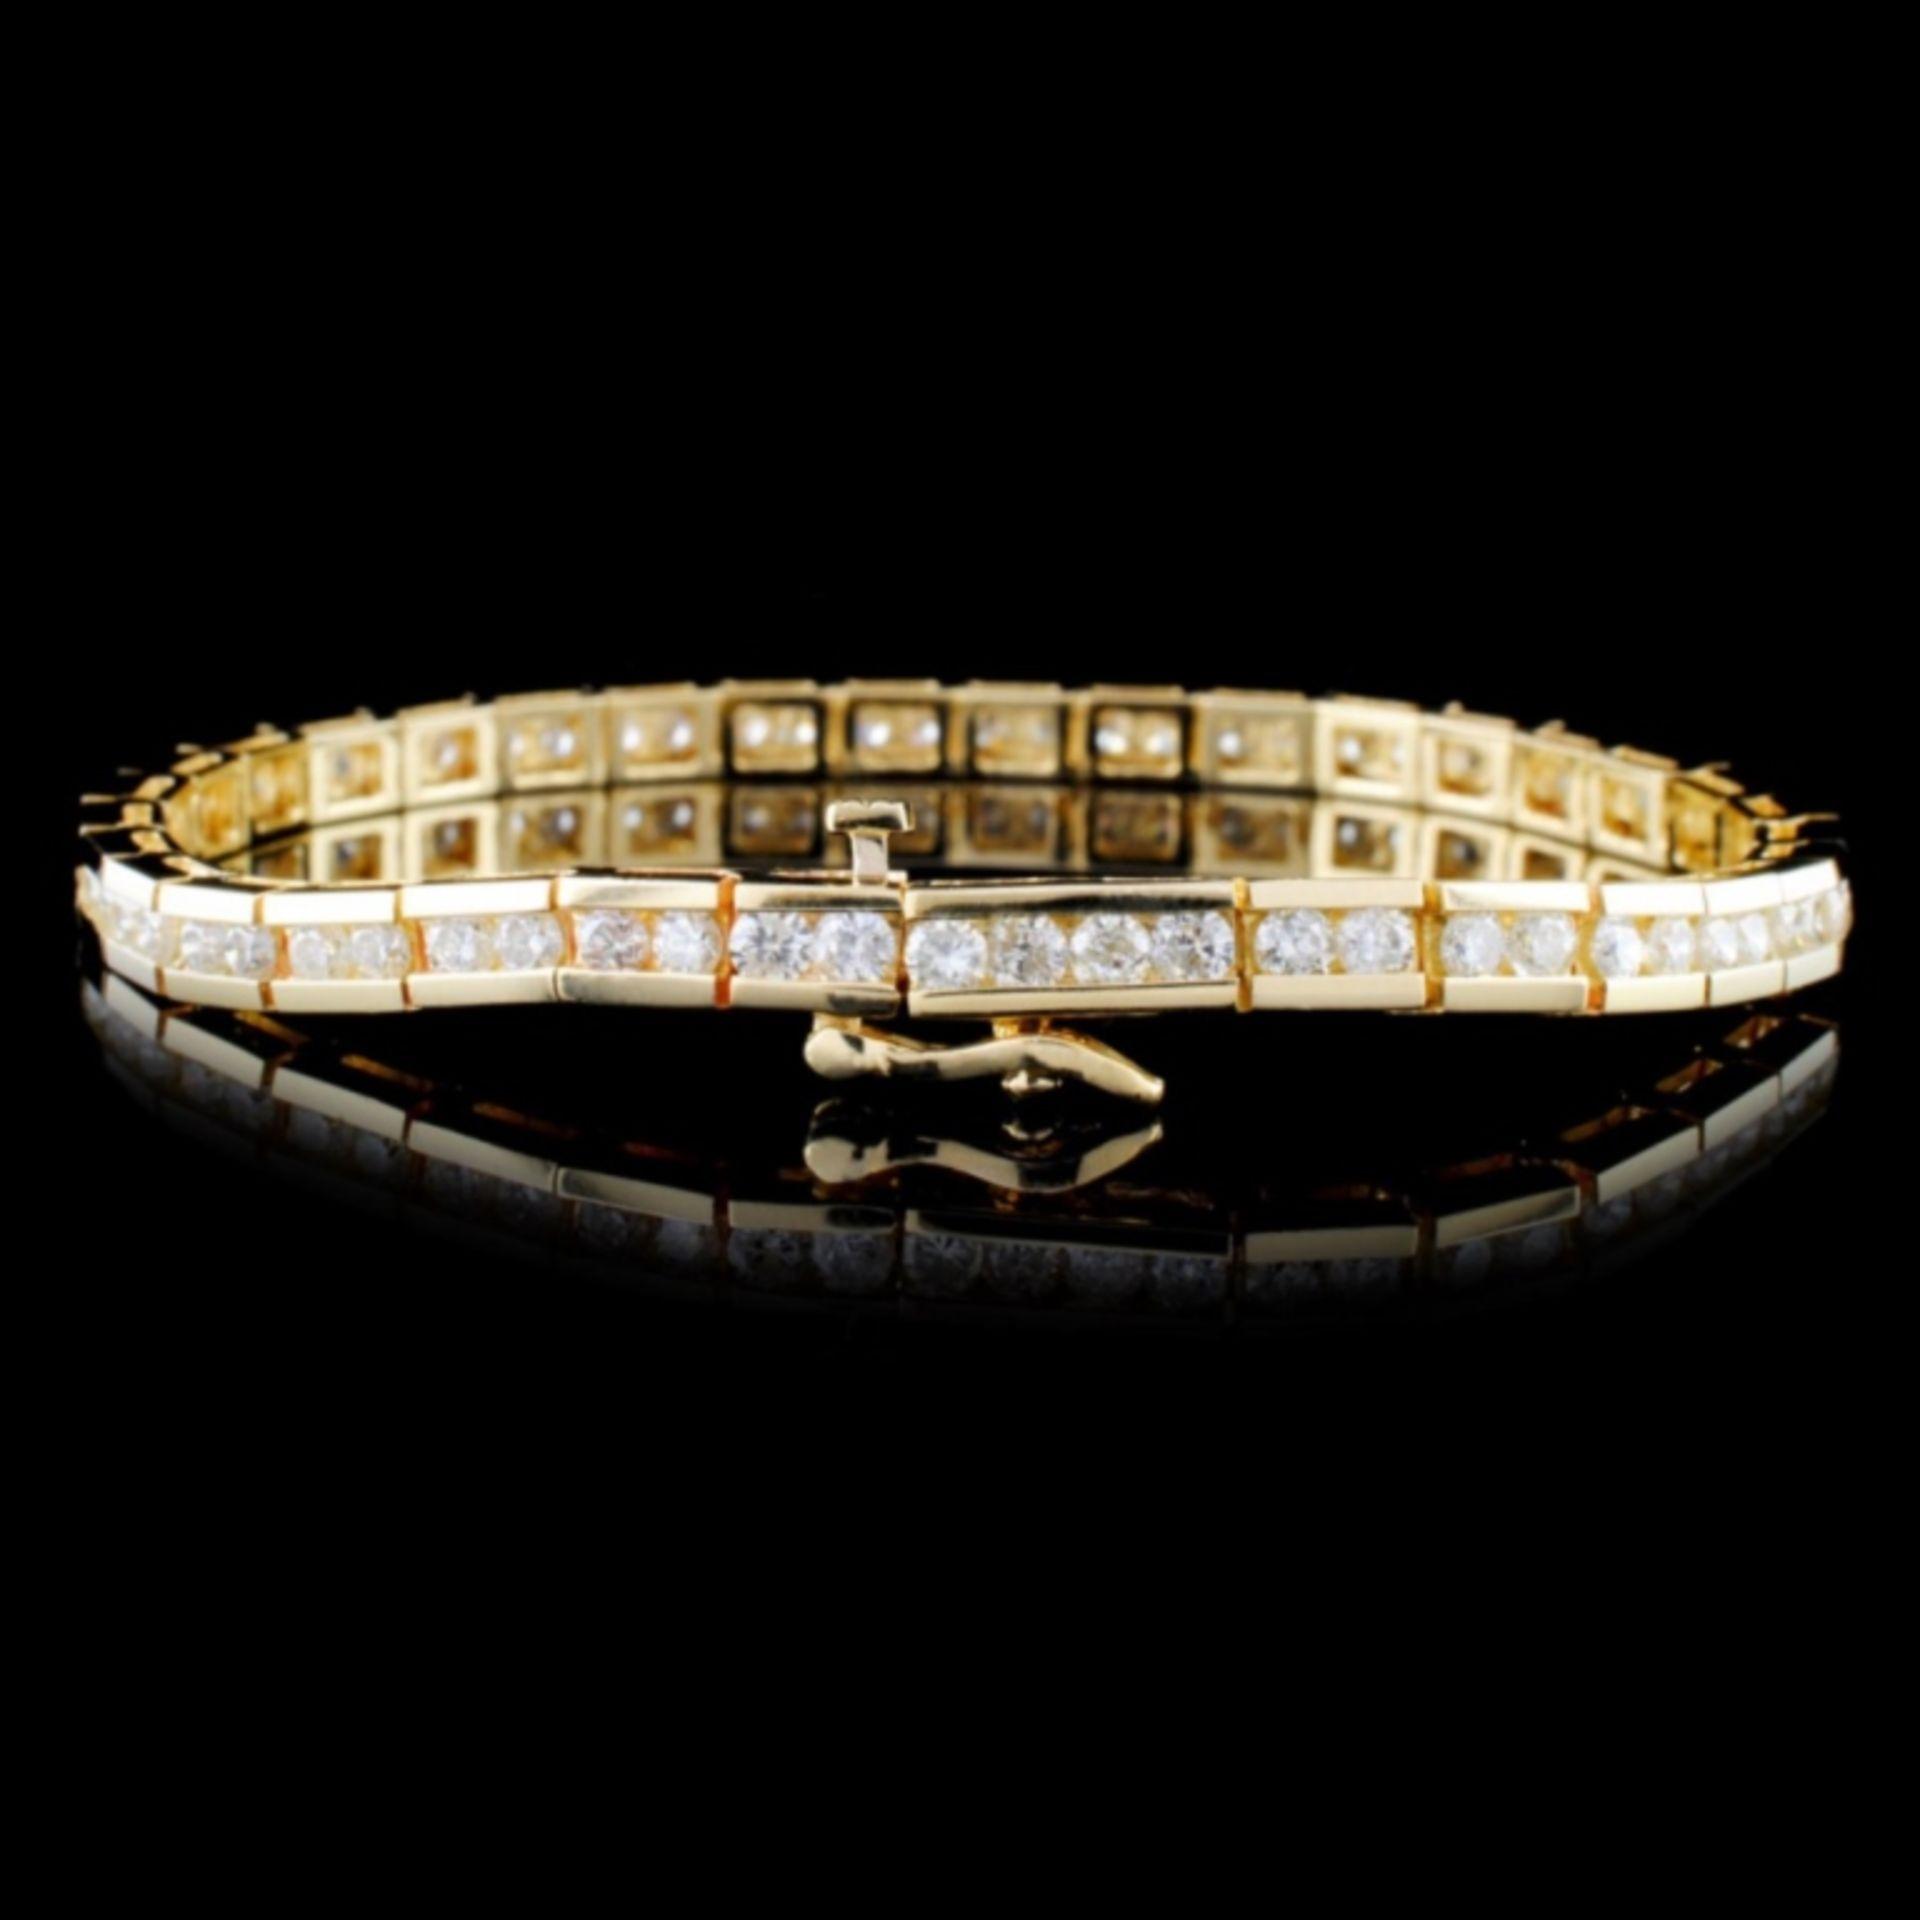 14K Yellow Gold 4.00ctw Diamond Bracelet - Image 2 of 3